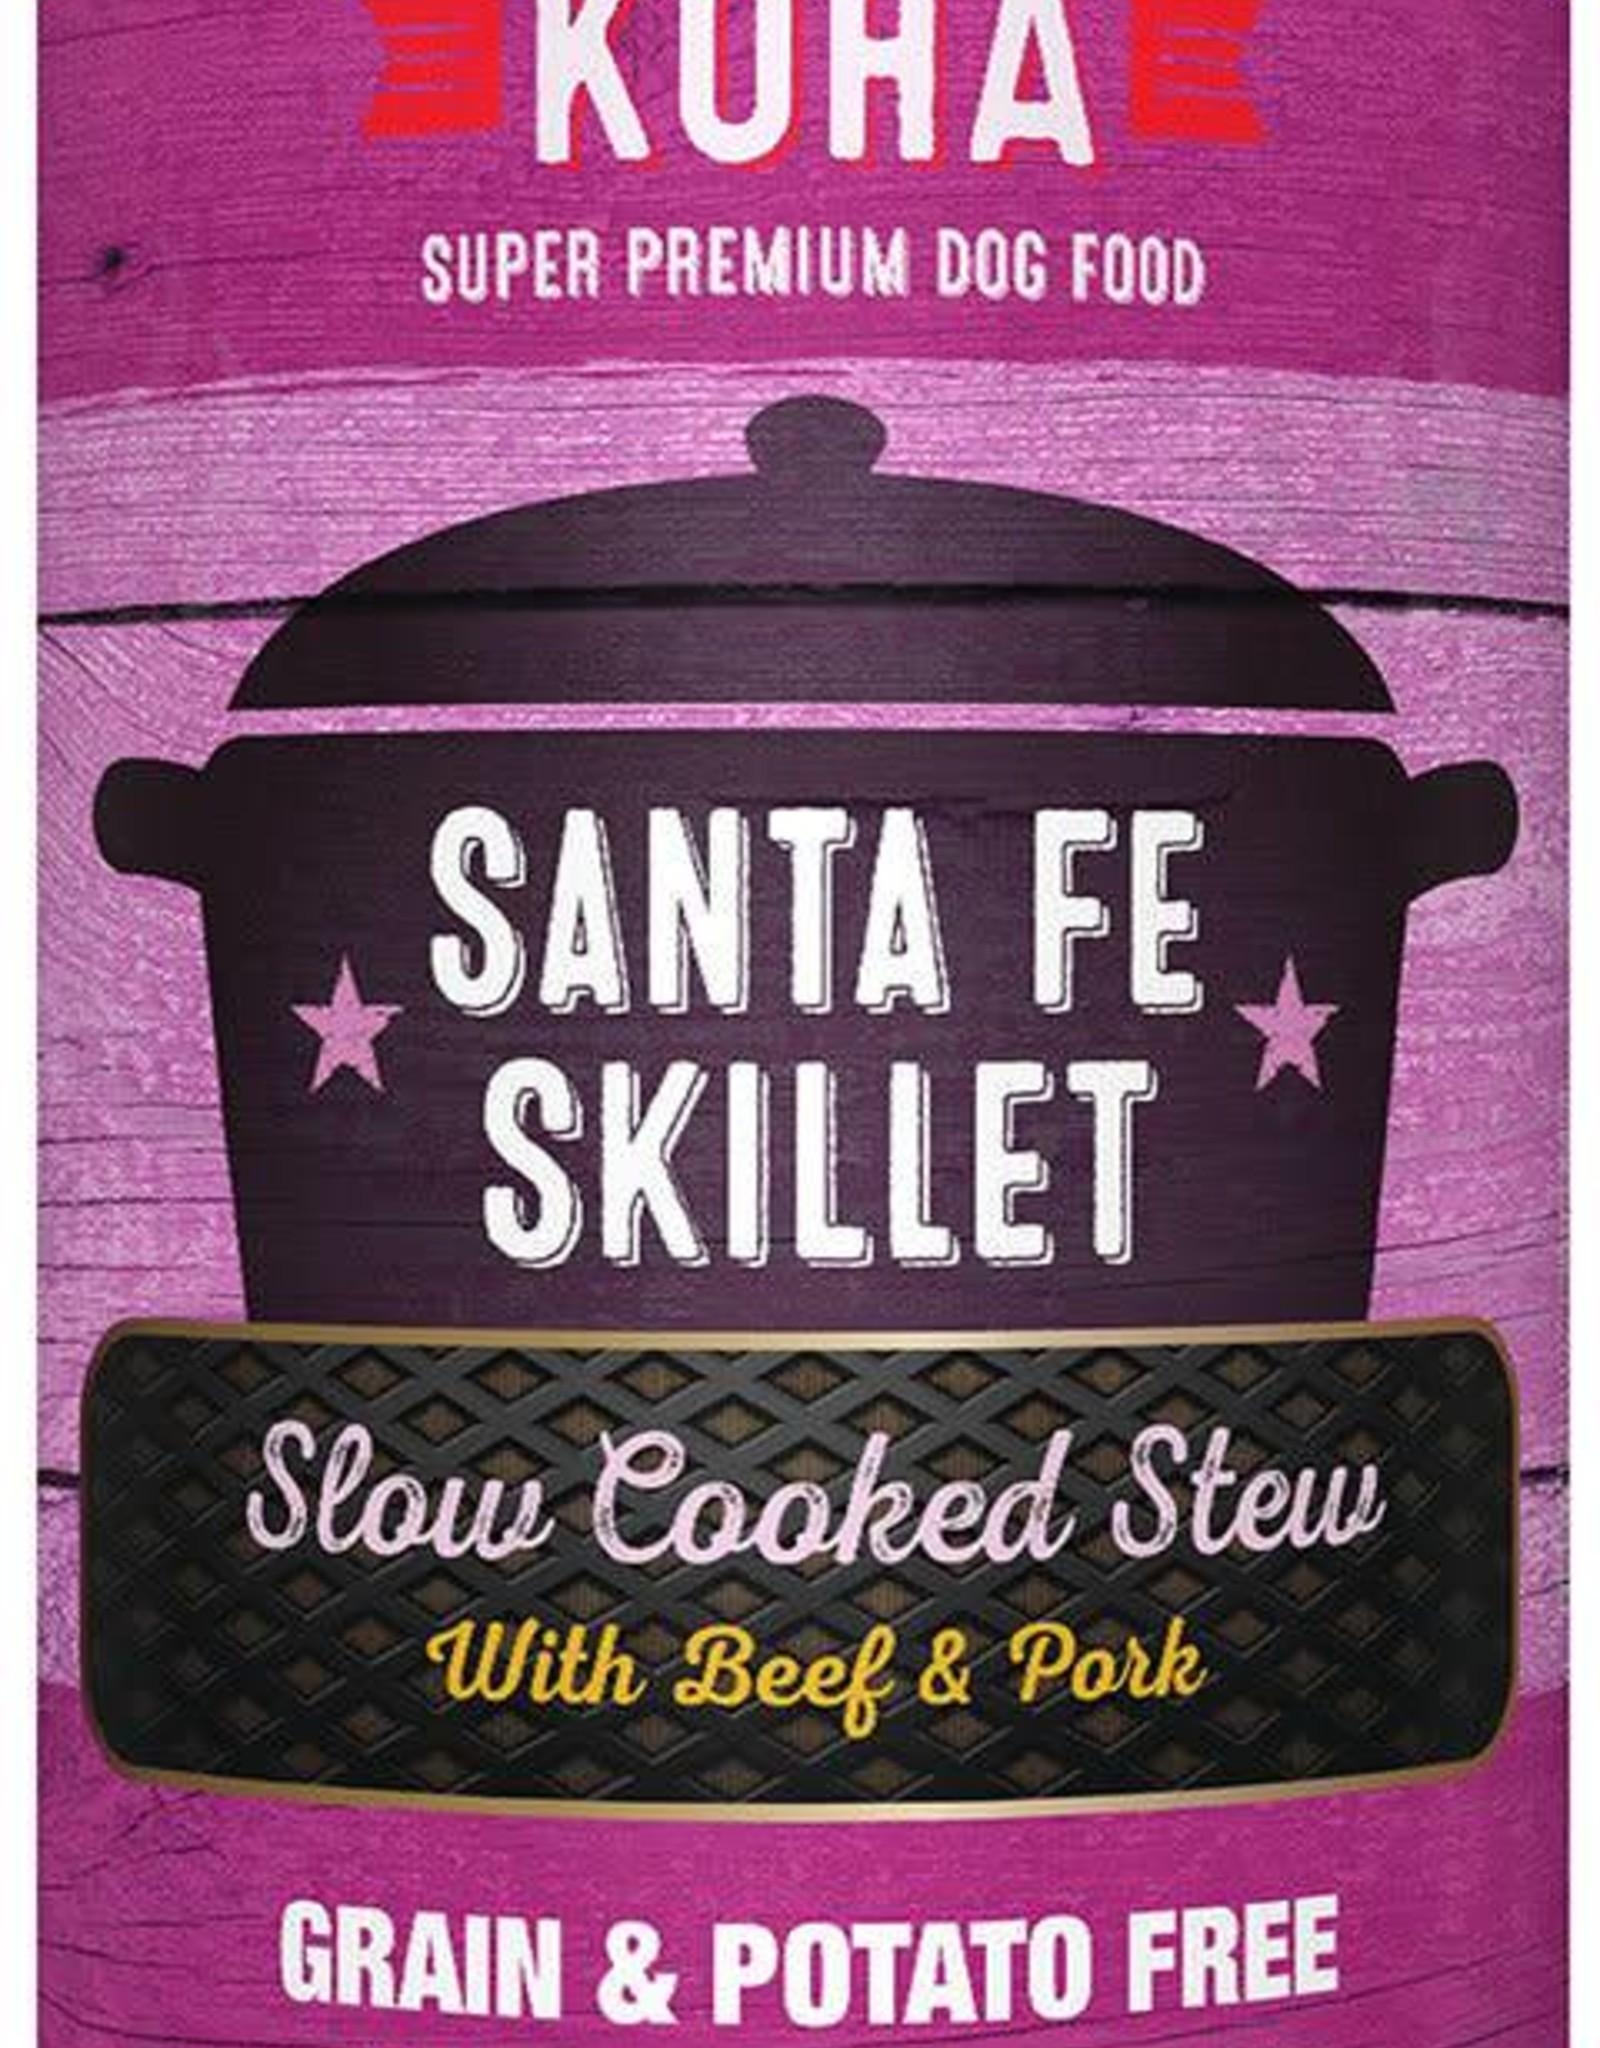 Koha Koha Pike Santa Fe Skillet Slow Cooked Stew for Dogs 12.7oz